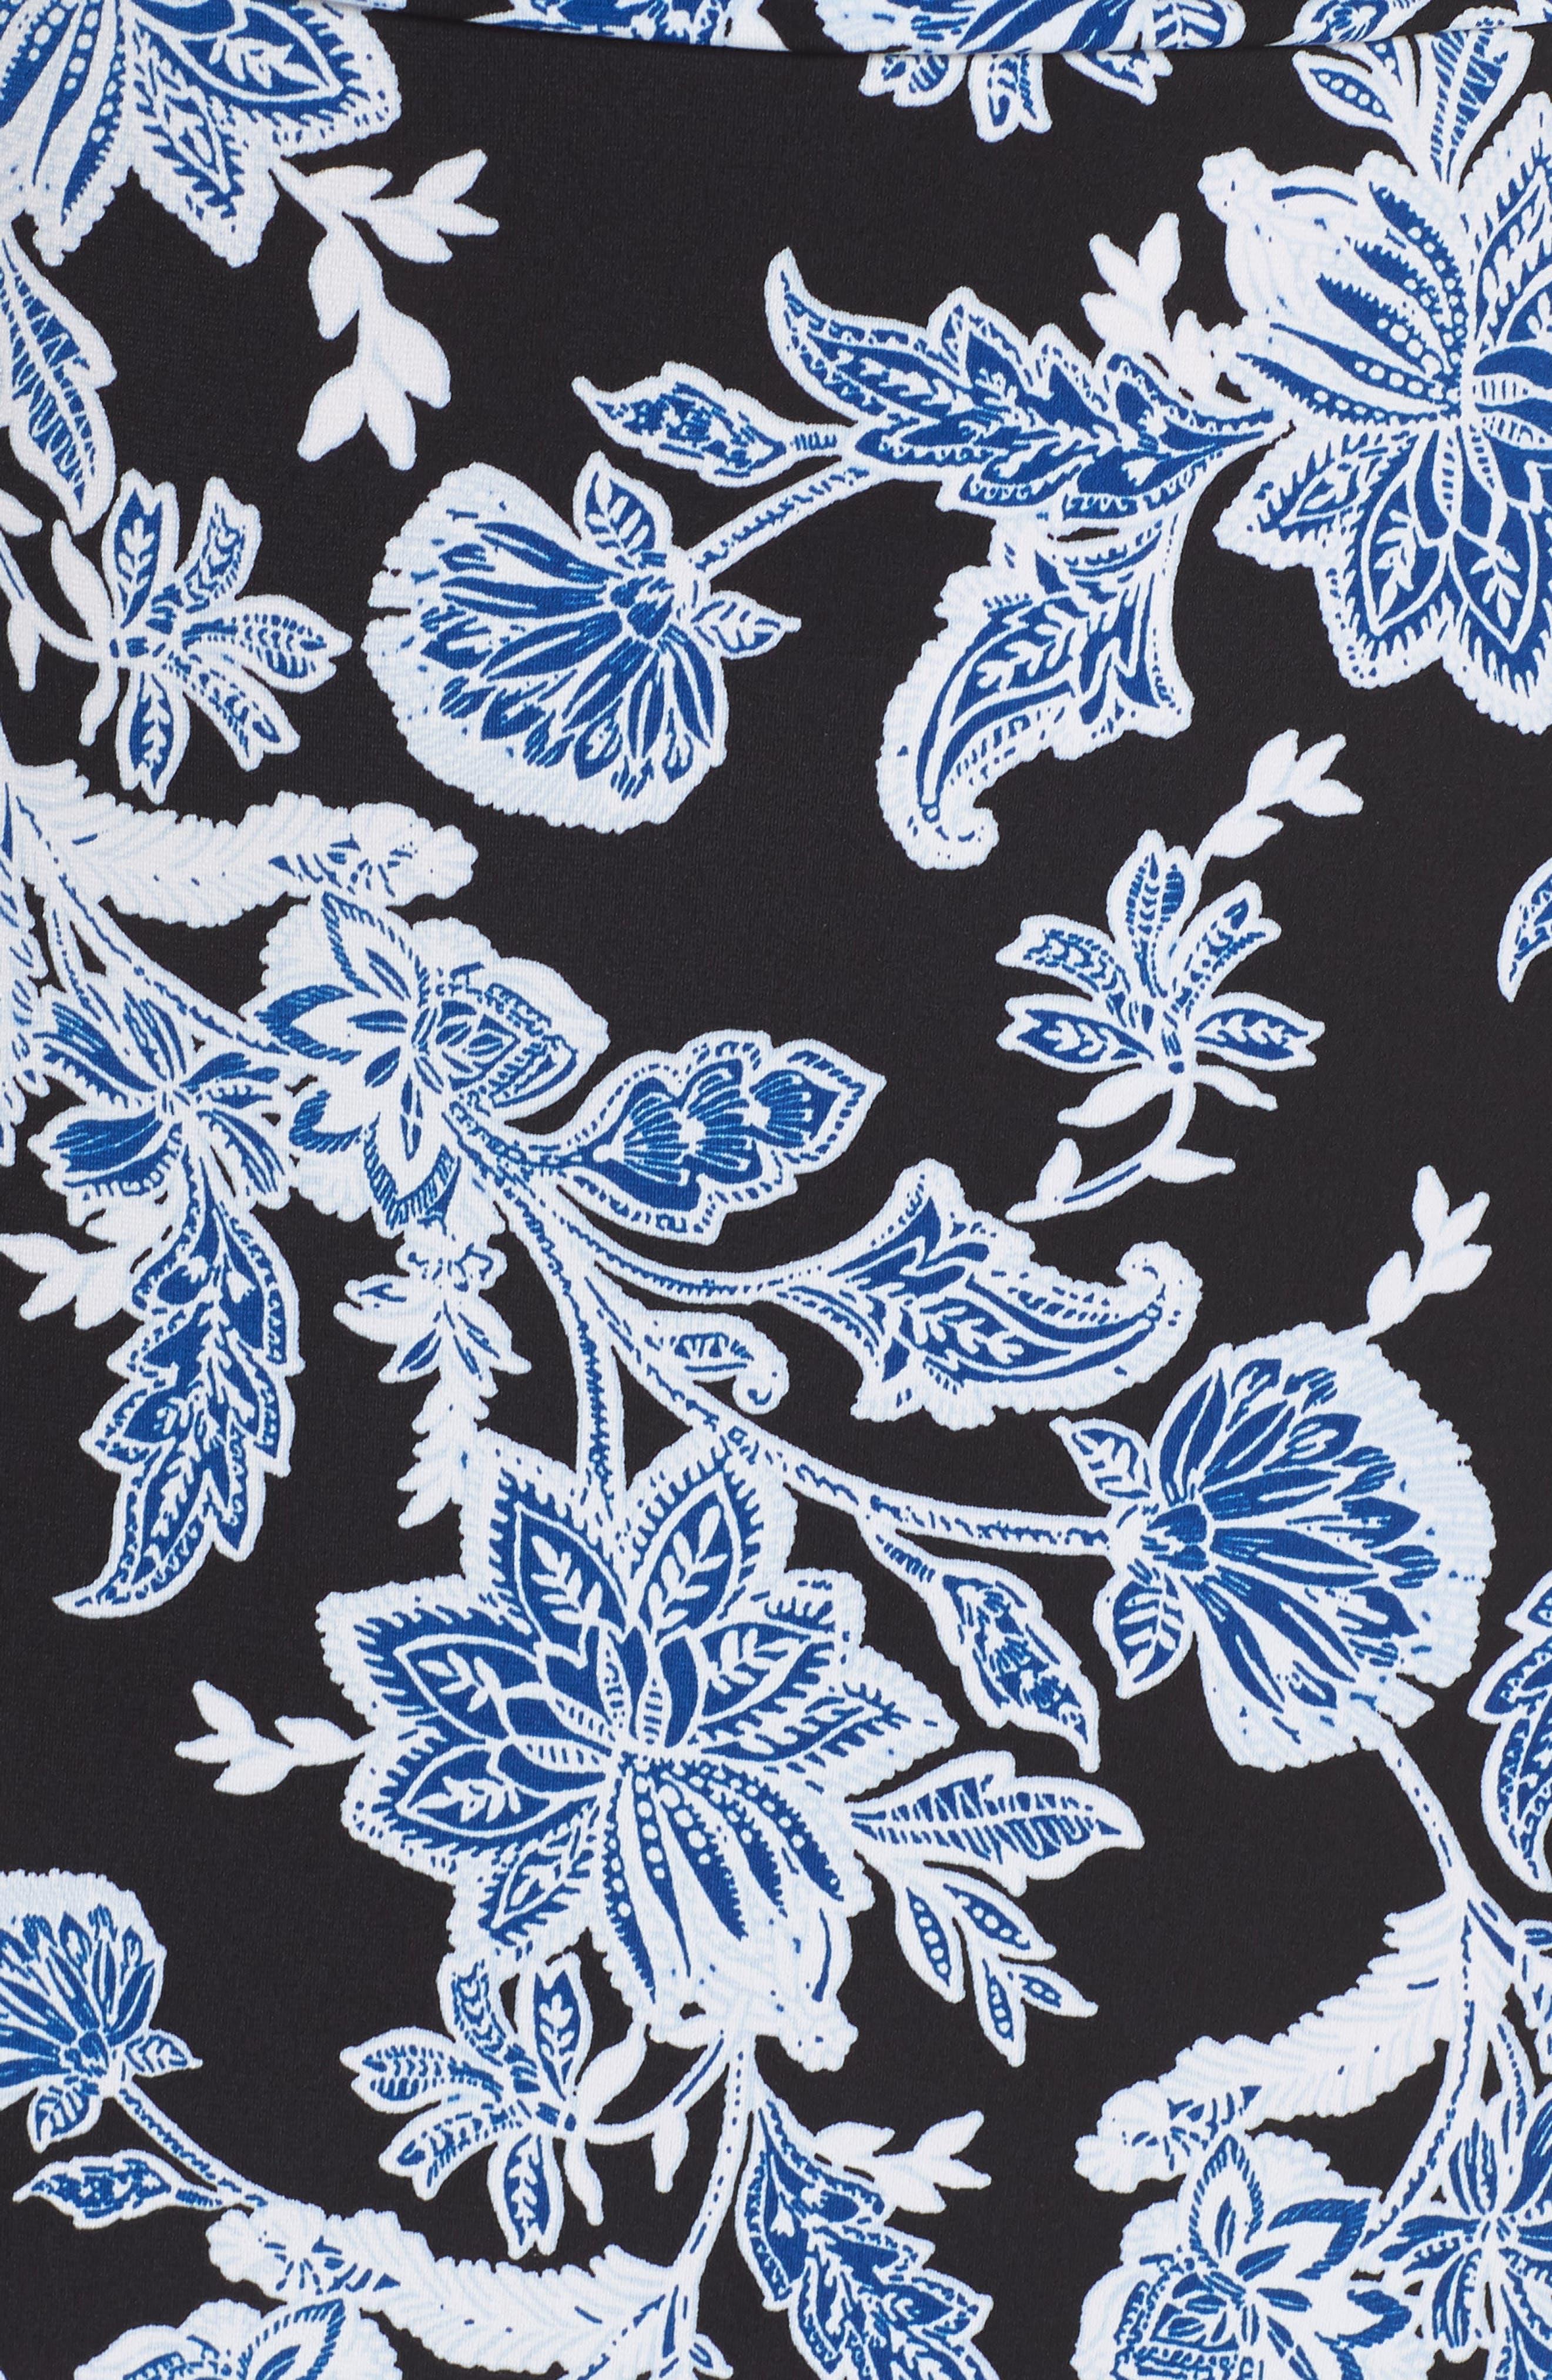 Woodblock Floral Maxi Dress,                             Alternate thumbnail 6, color,                             010